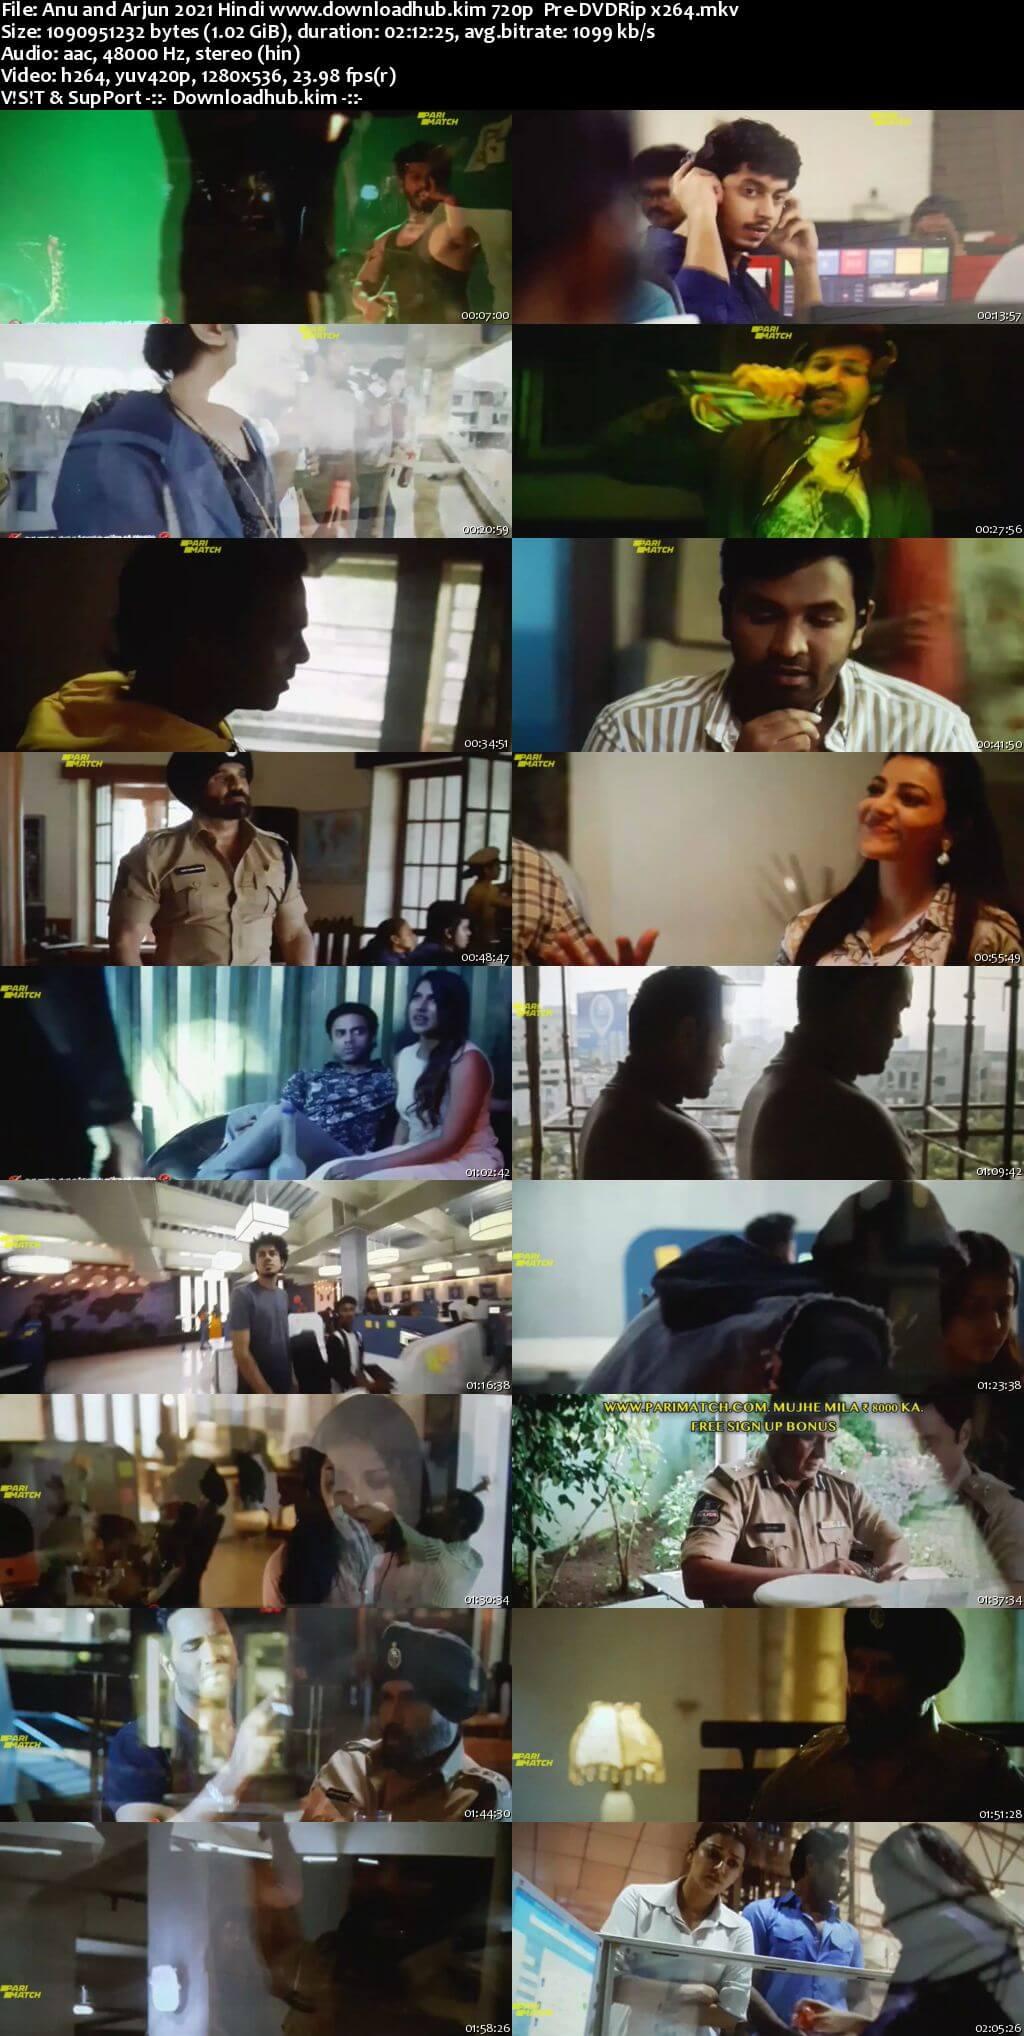 Anu and Arjun 2021 Hindi 720p 480p Pre-DVDRip x264